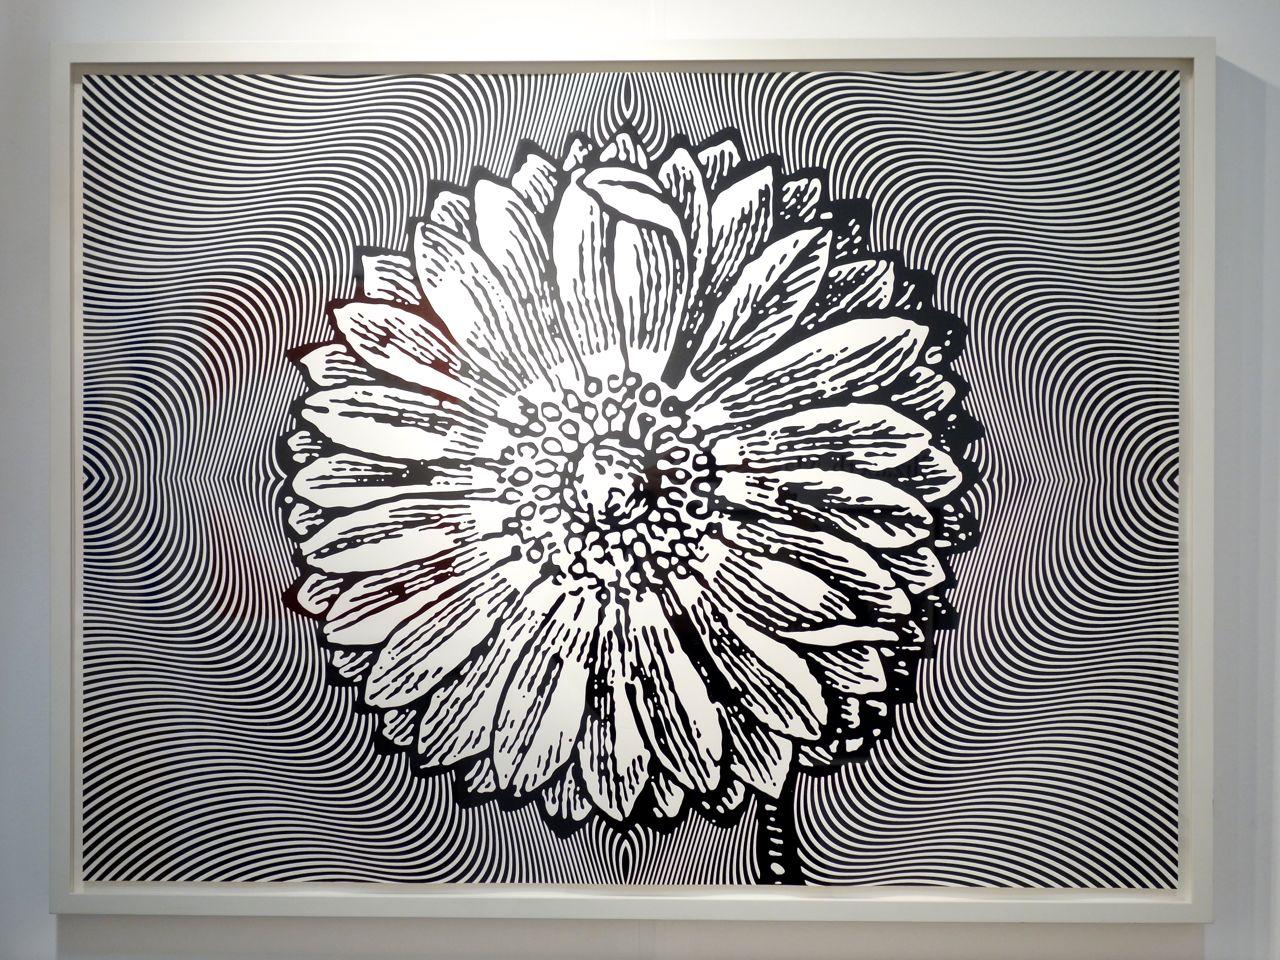 Paul Morrison, 'Psychotrope', 2013, Screenprint, 73.5 x 99 cm. Manifold Editions (London)